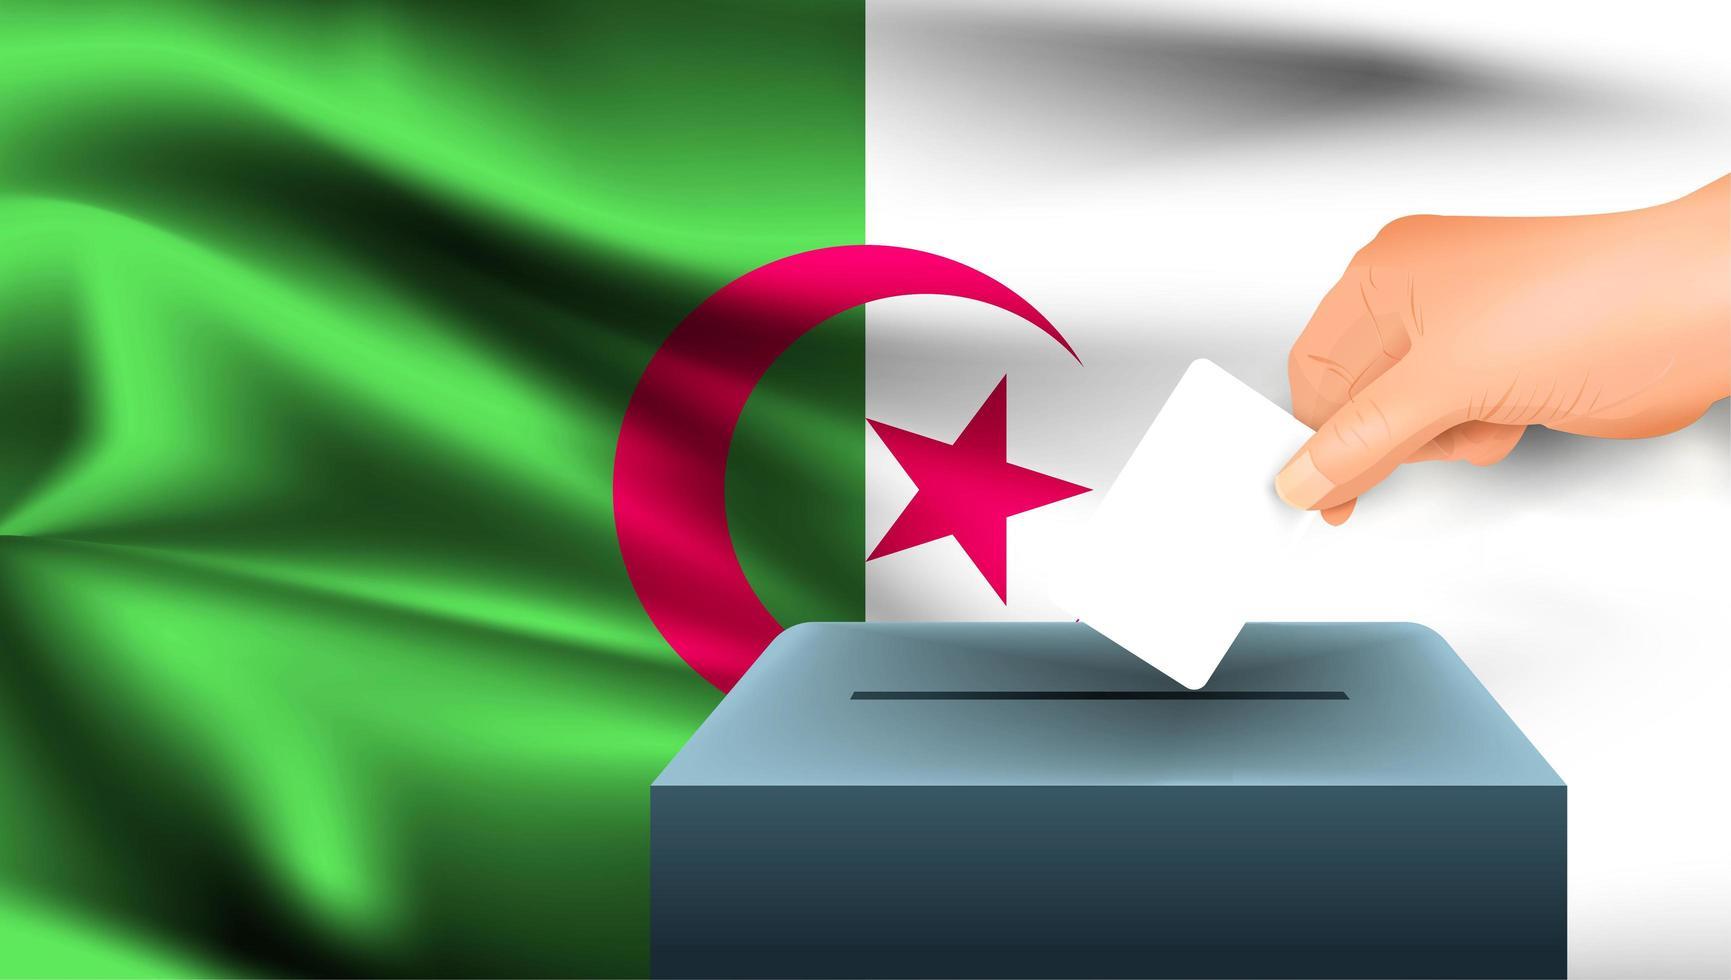 Hand putting ballot into box with Algerian flag  vector